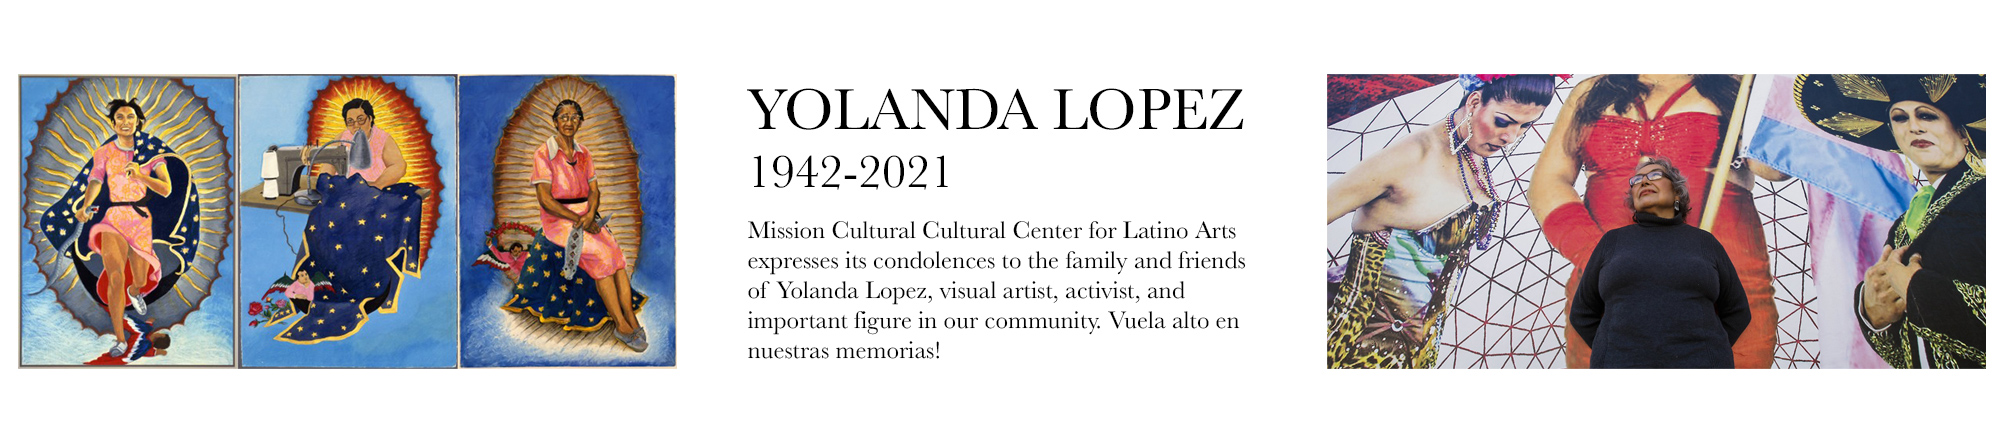 Yolanda Lopez (1942 – 2021) Mission Cultural Cultural Center for Latino Arts expresses its condolences to the family and friends of Yolanda Lopez, visual artist, activist, and important figure in our community. Vuela alto en nuestras memorias!